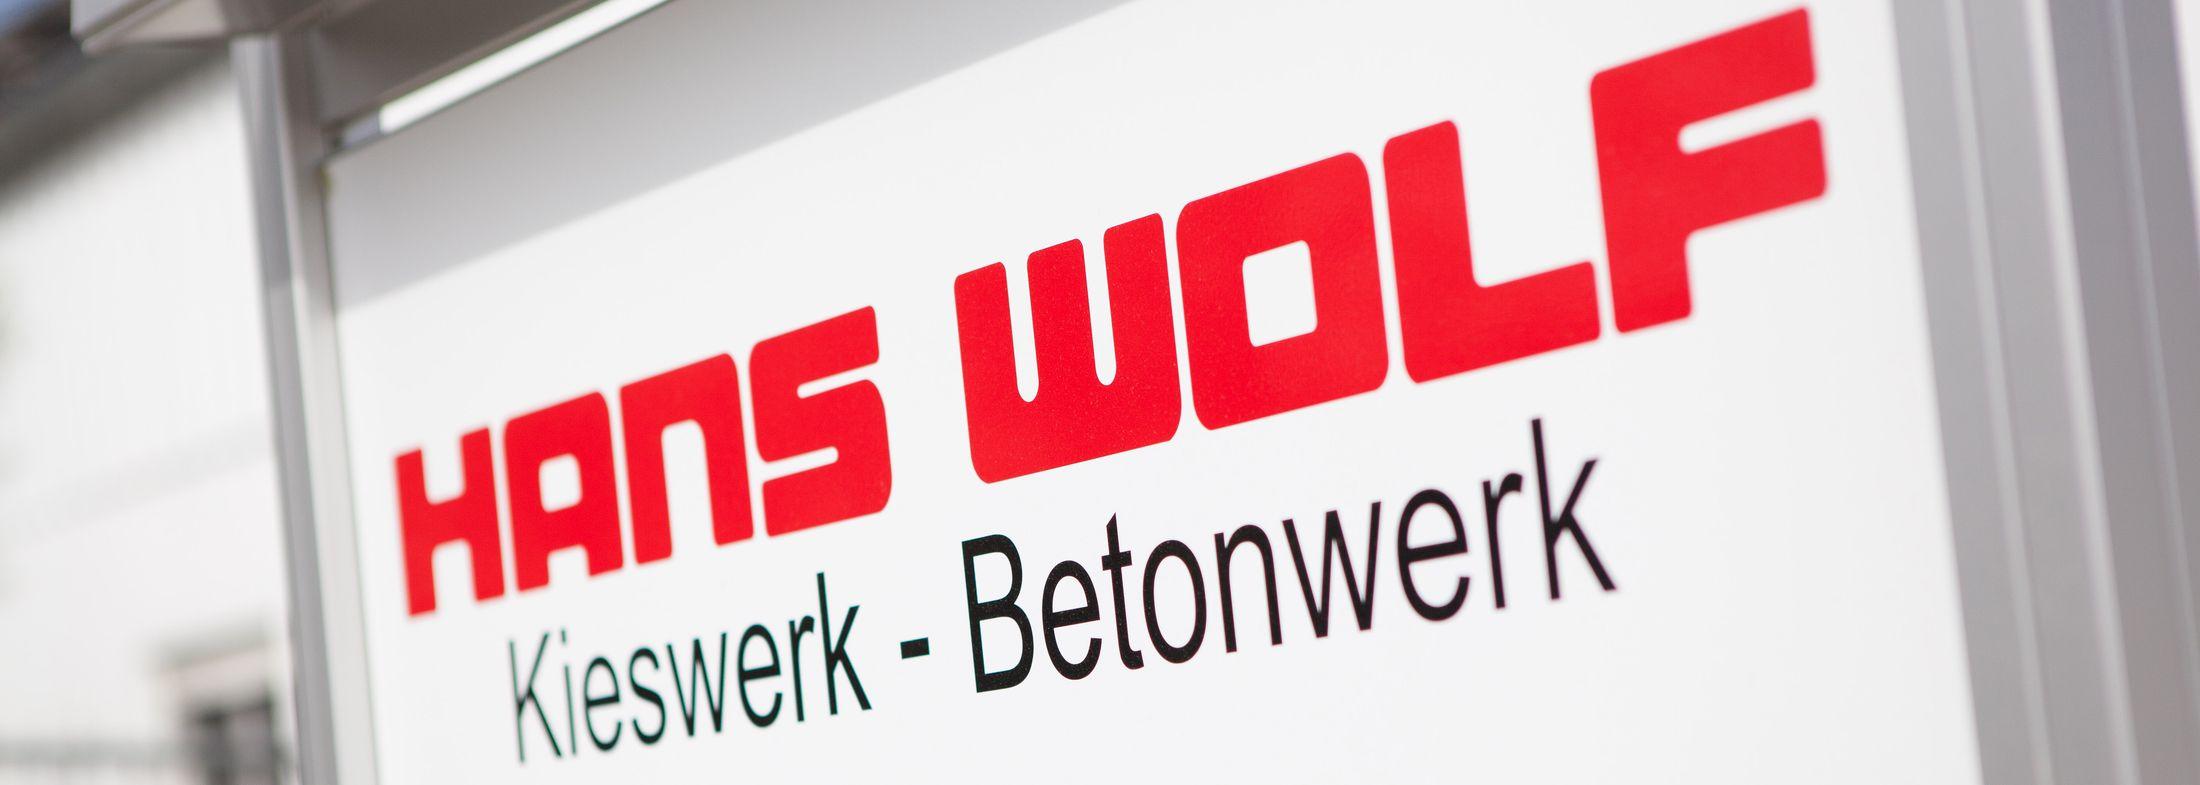 Home - Hans Wolf Gmbh & Co. Kg Kieswerk, Betonwerk, Erdarbeiten